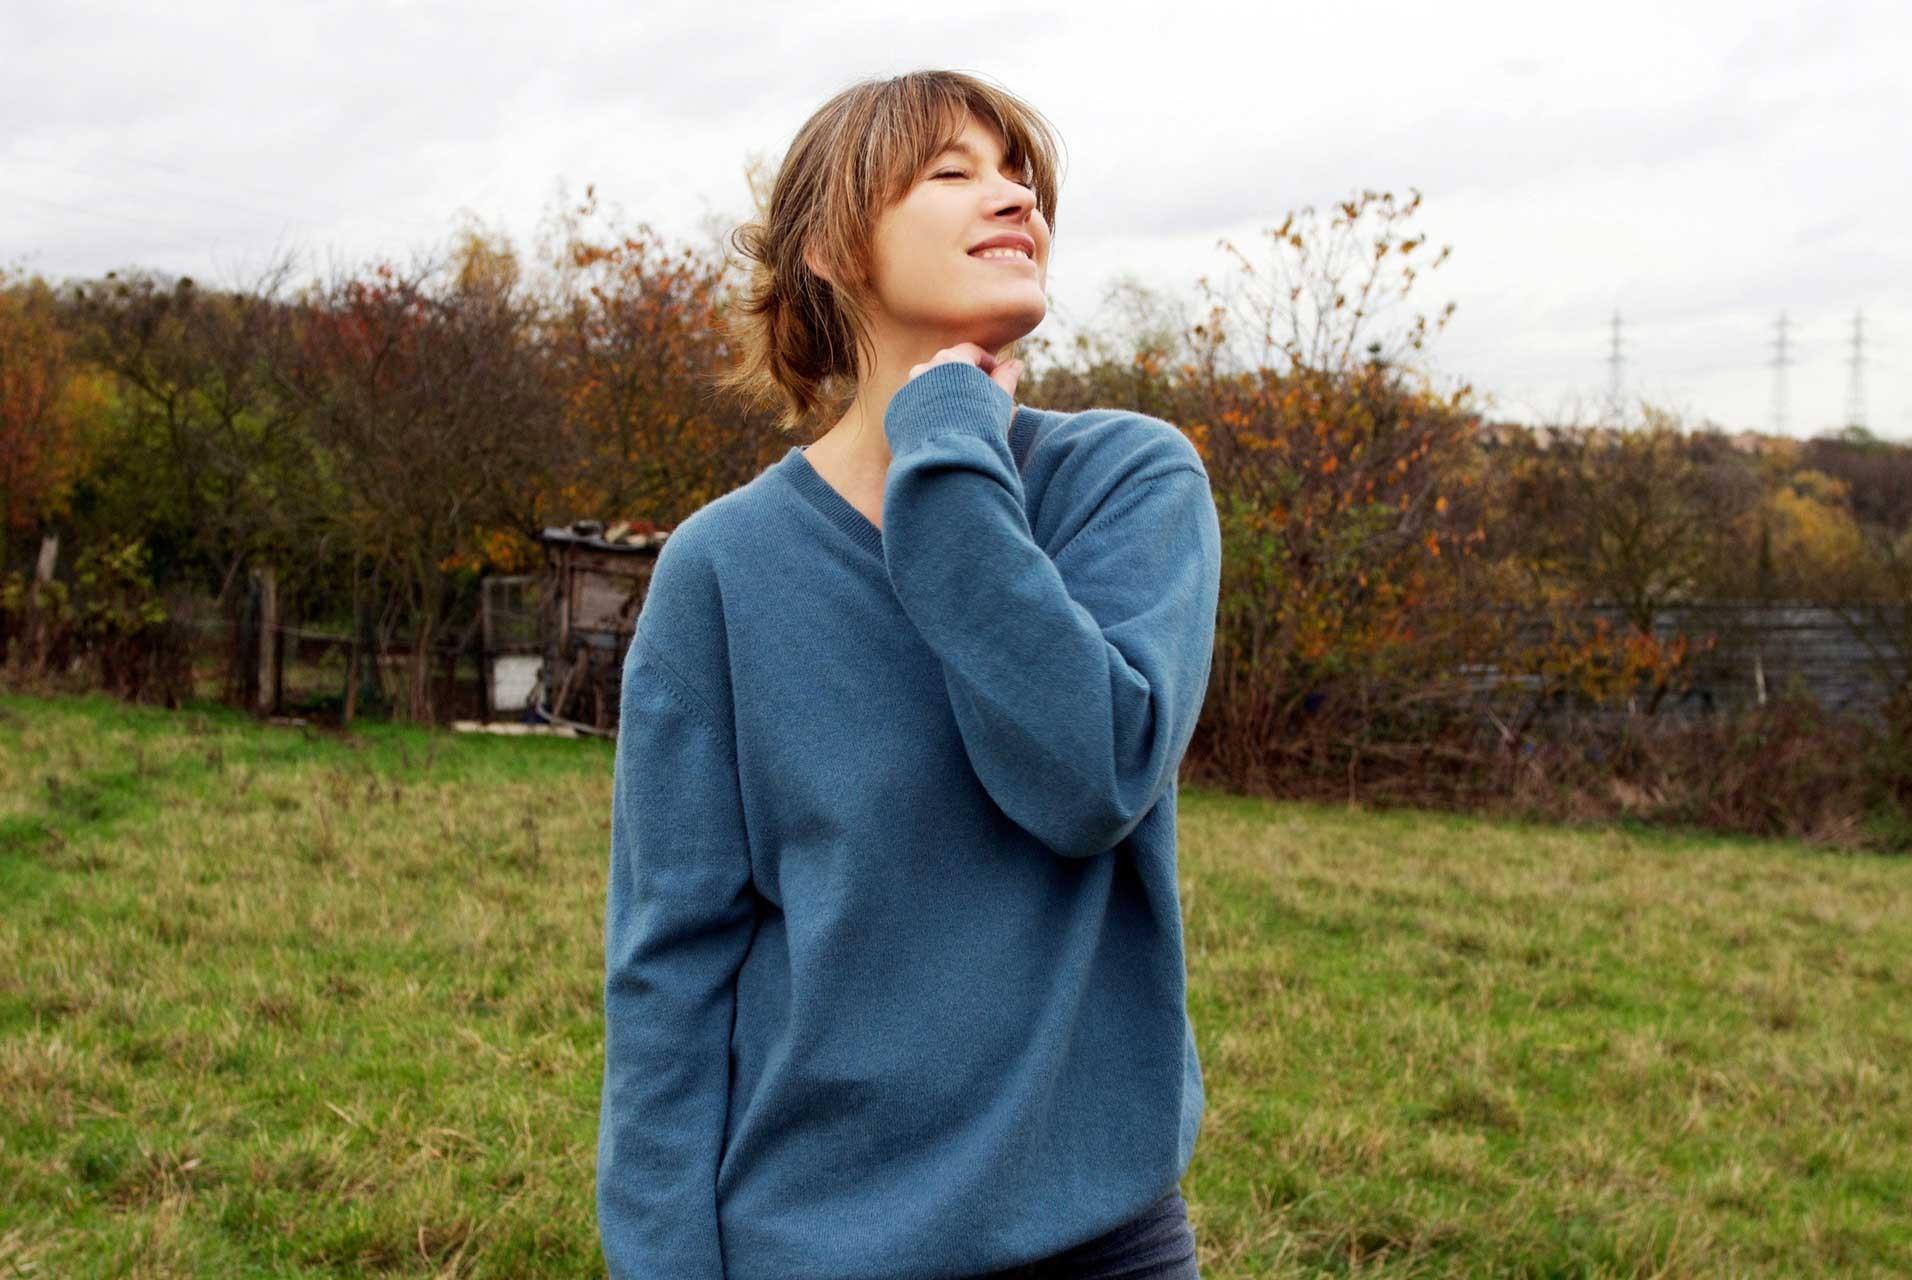 Laure-Maud_photographe_portrait_05_Nicole-Pache_1